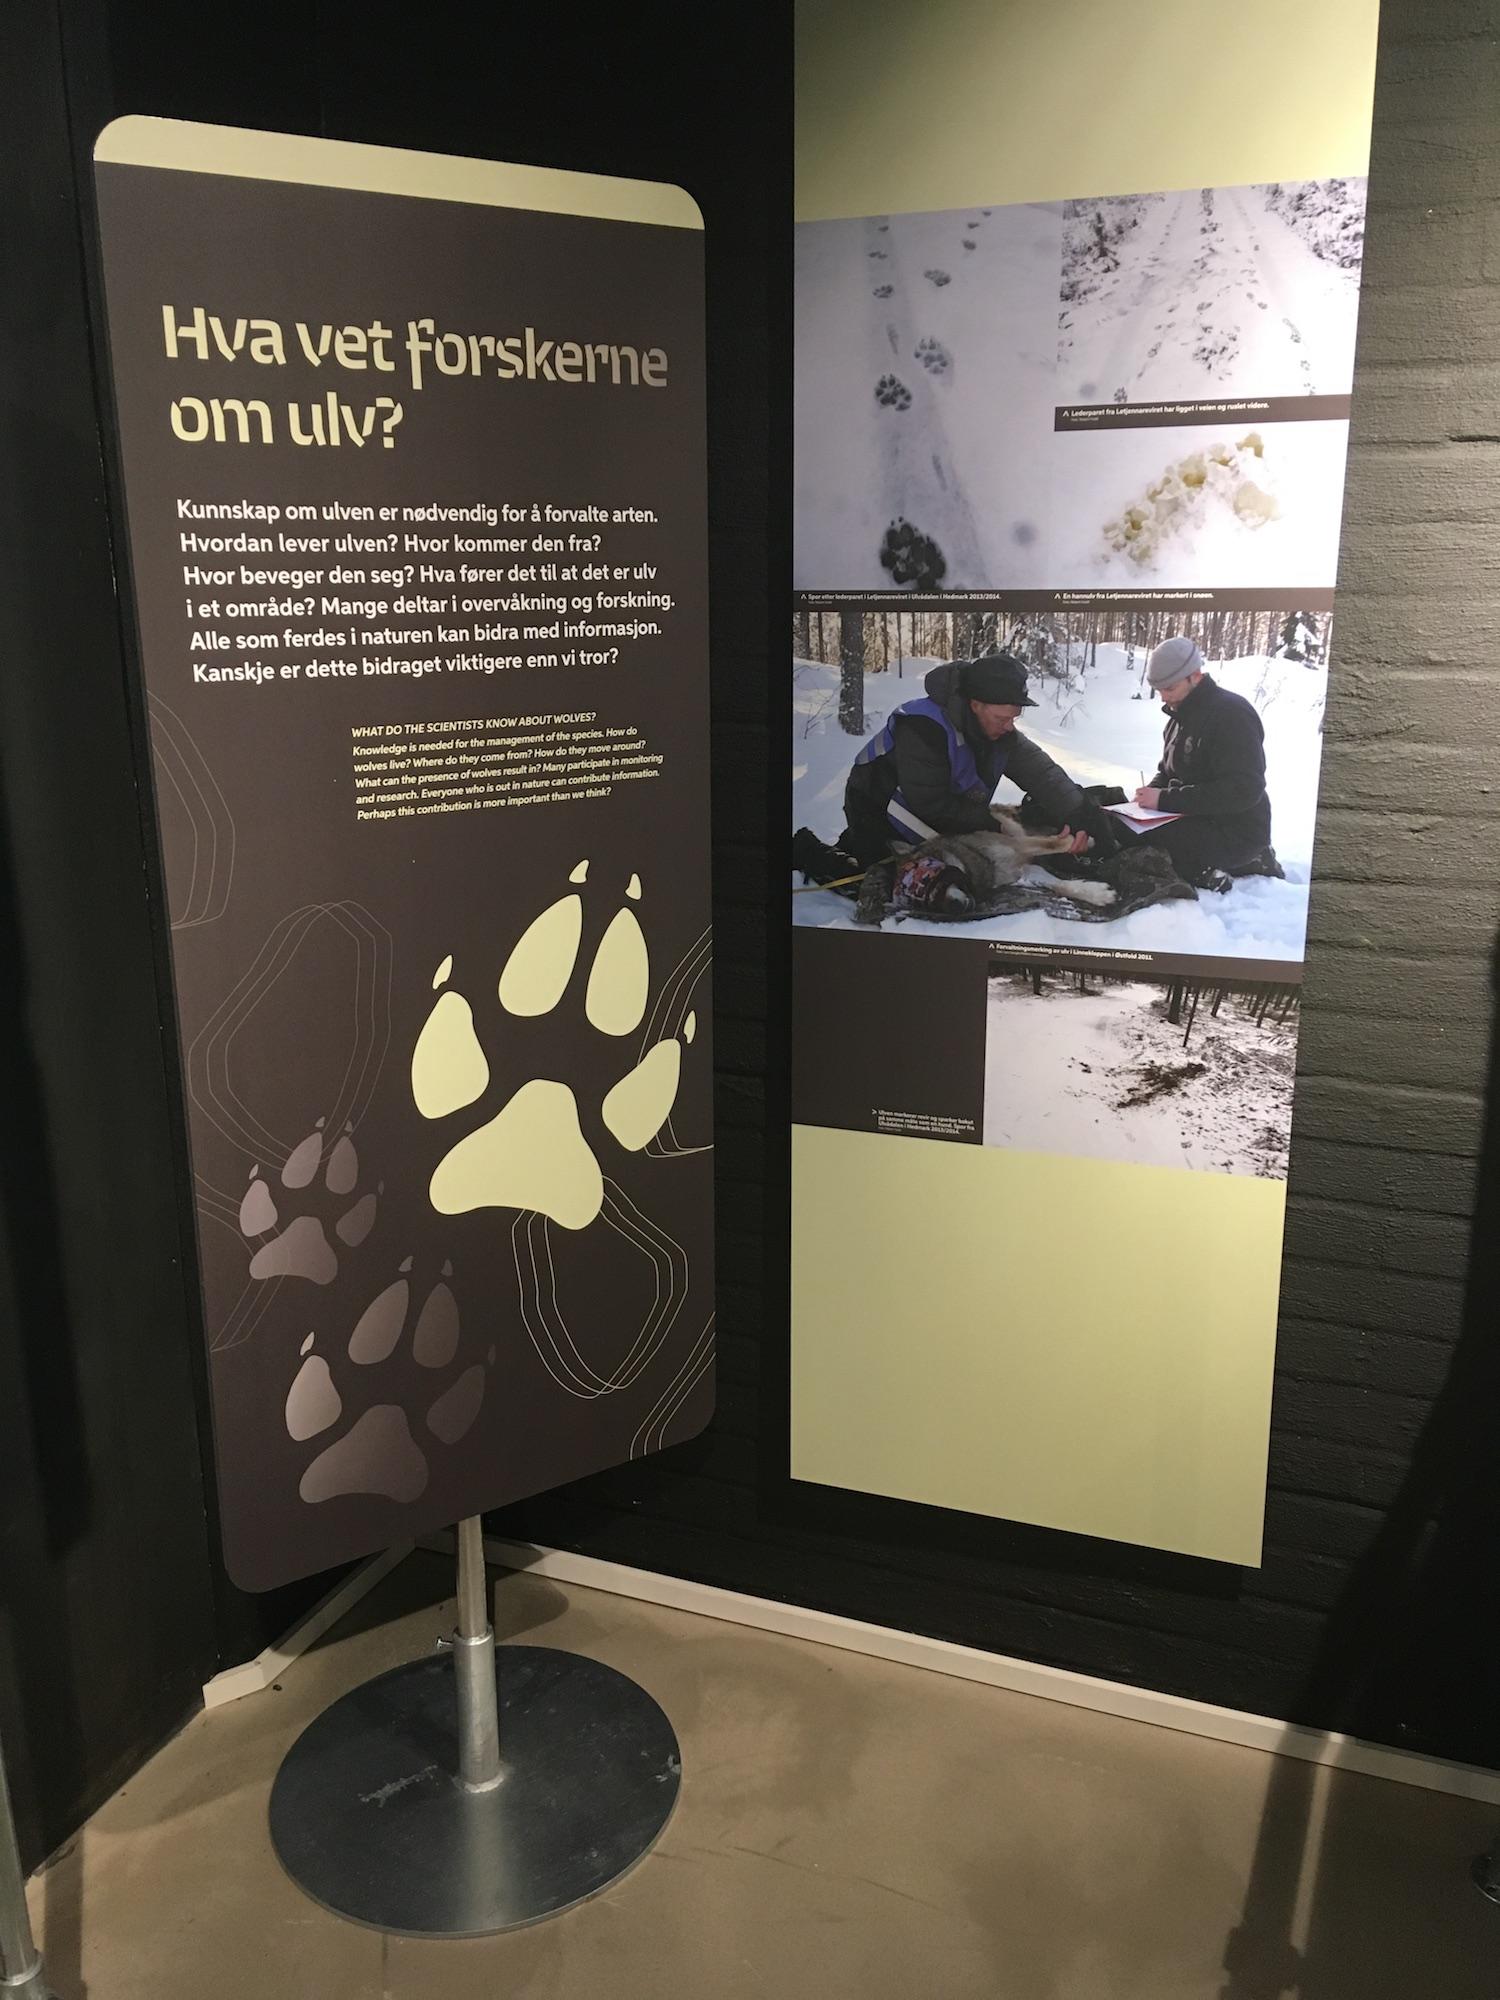 FORSKNING: Hva sier forskningen om ulv? FOTO: Elise Lund